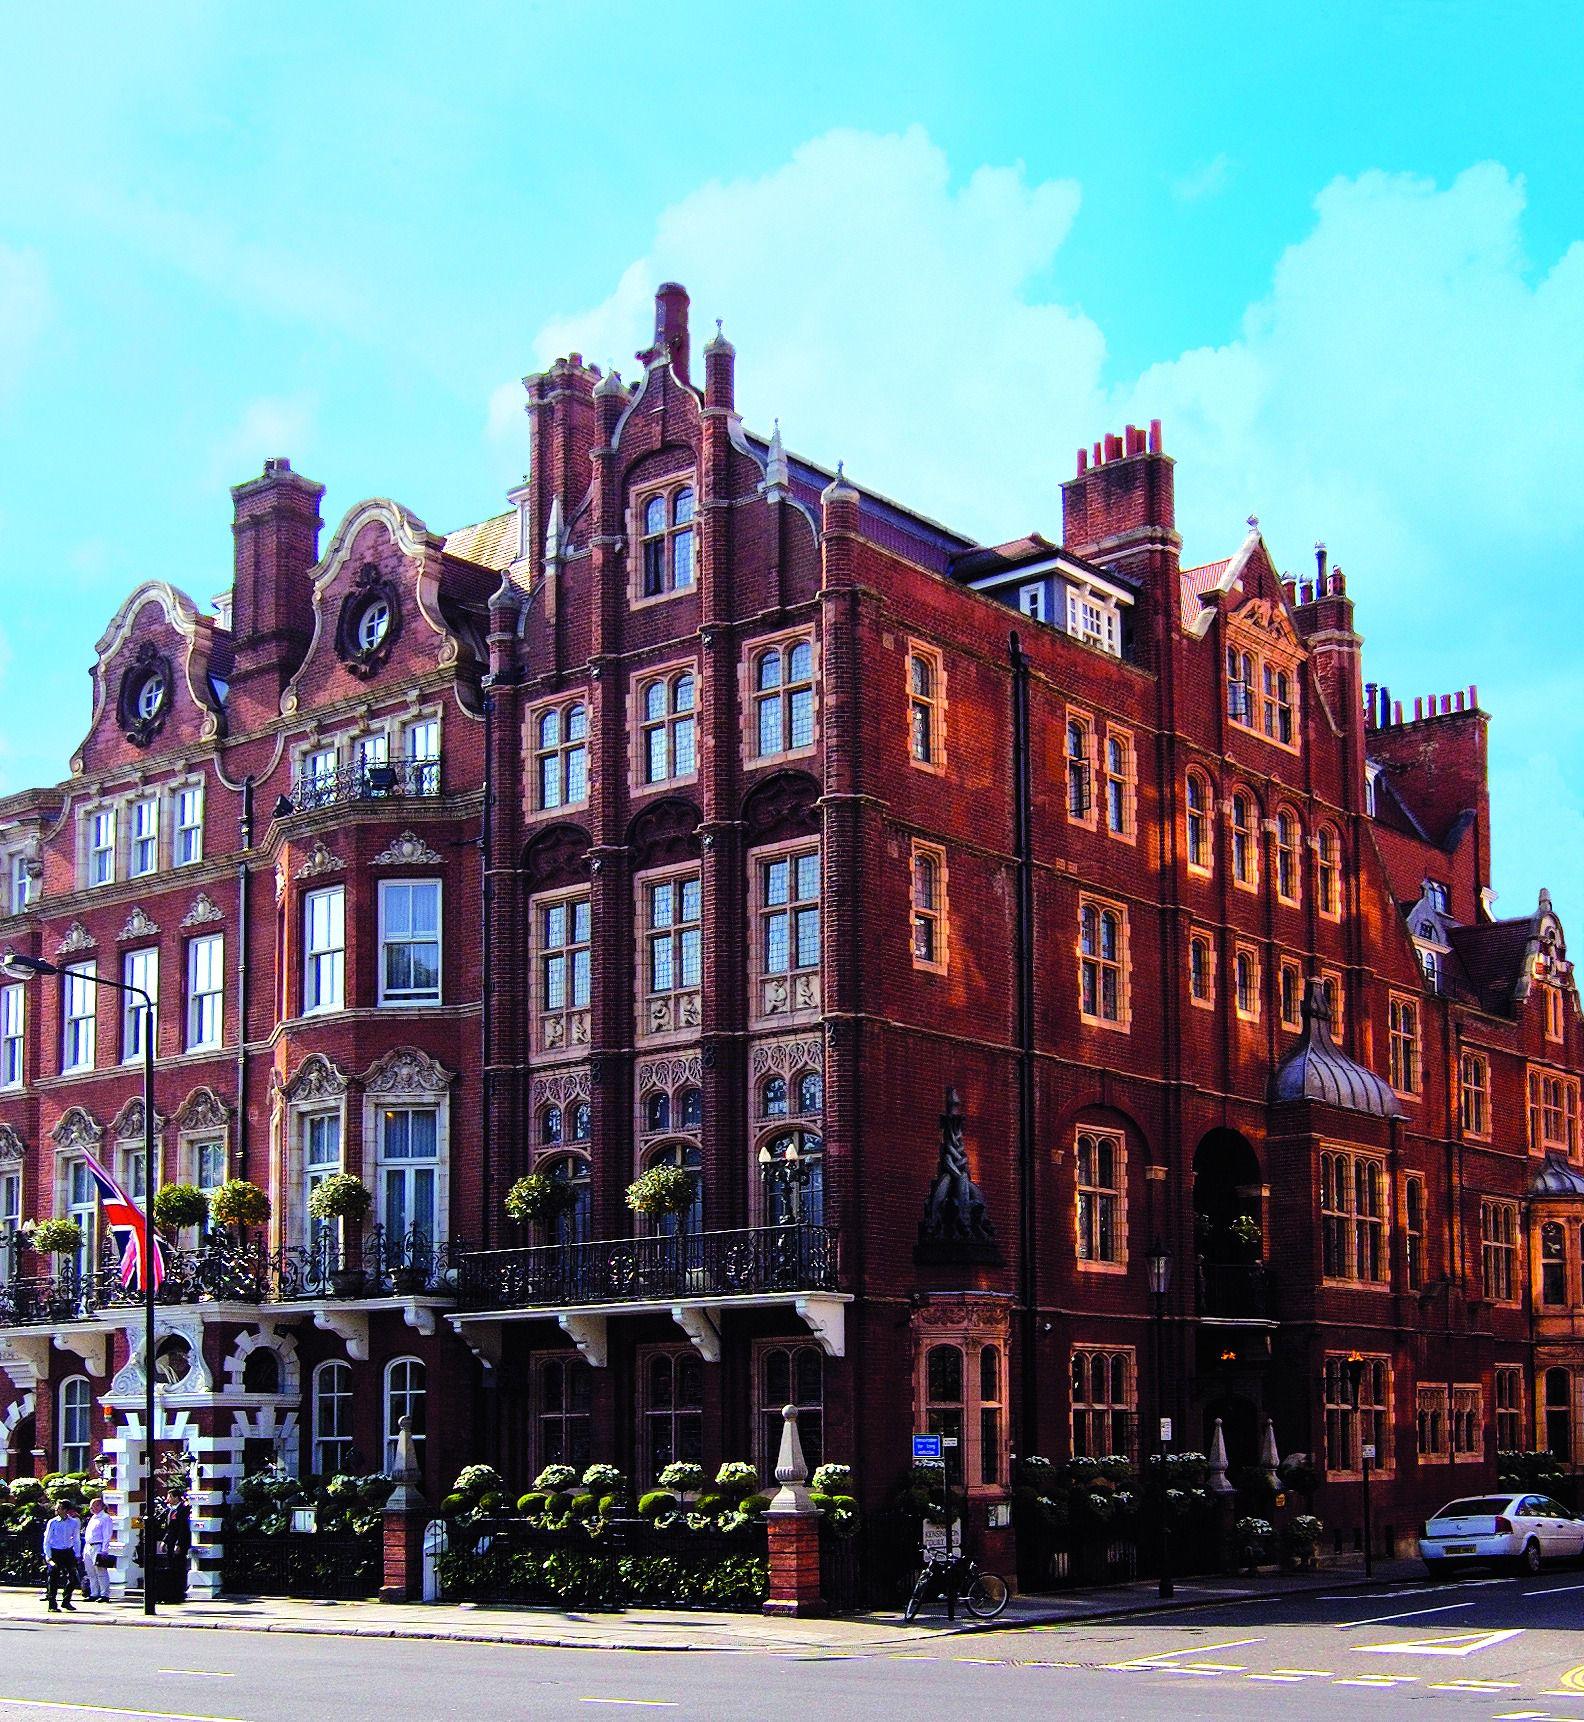 London Hotel Kensington Gardens: The Milestone Hotel, Kensington